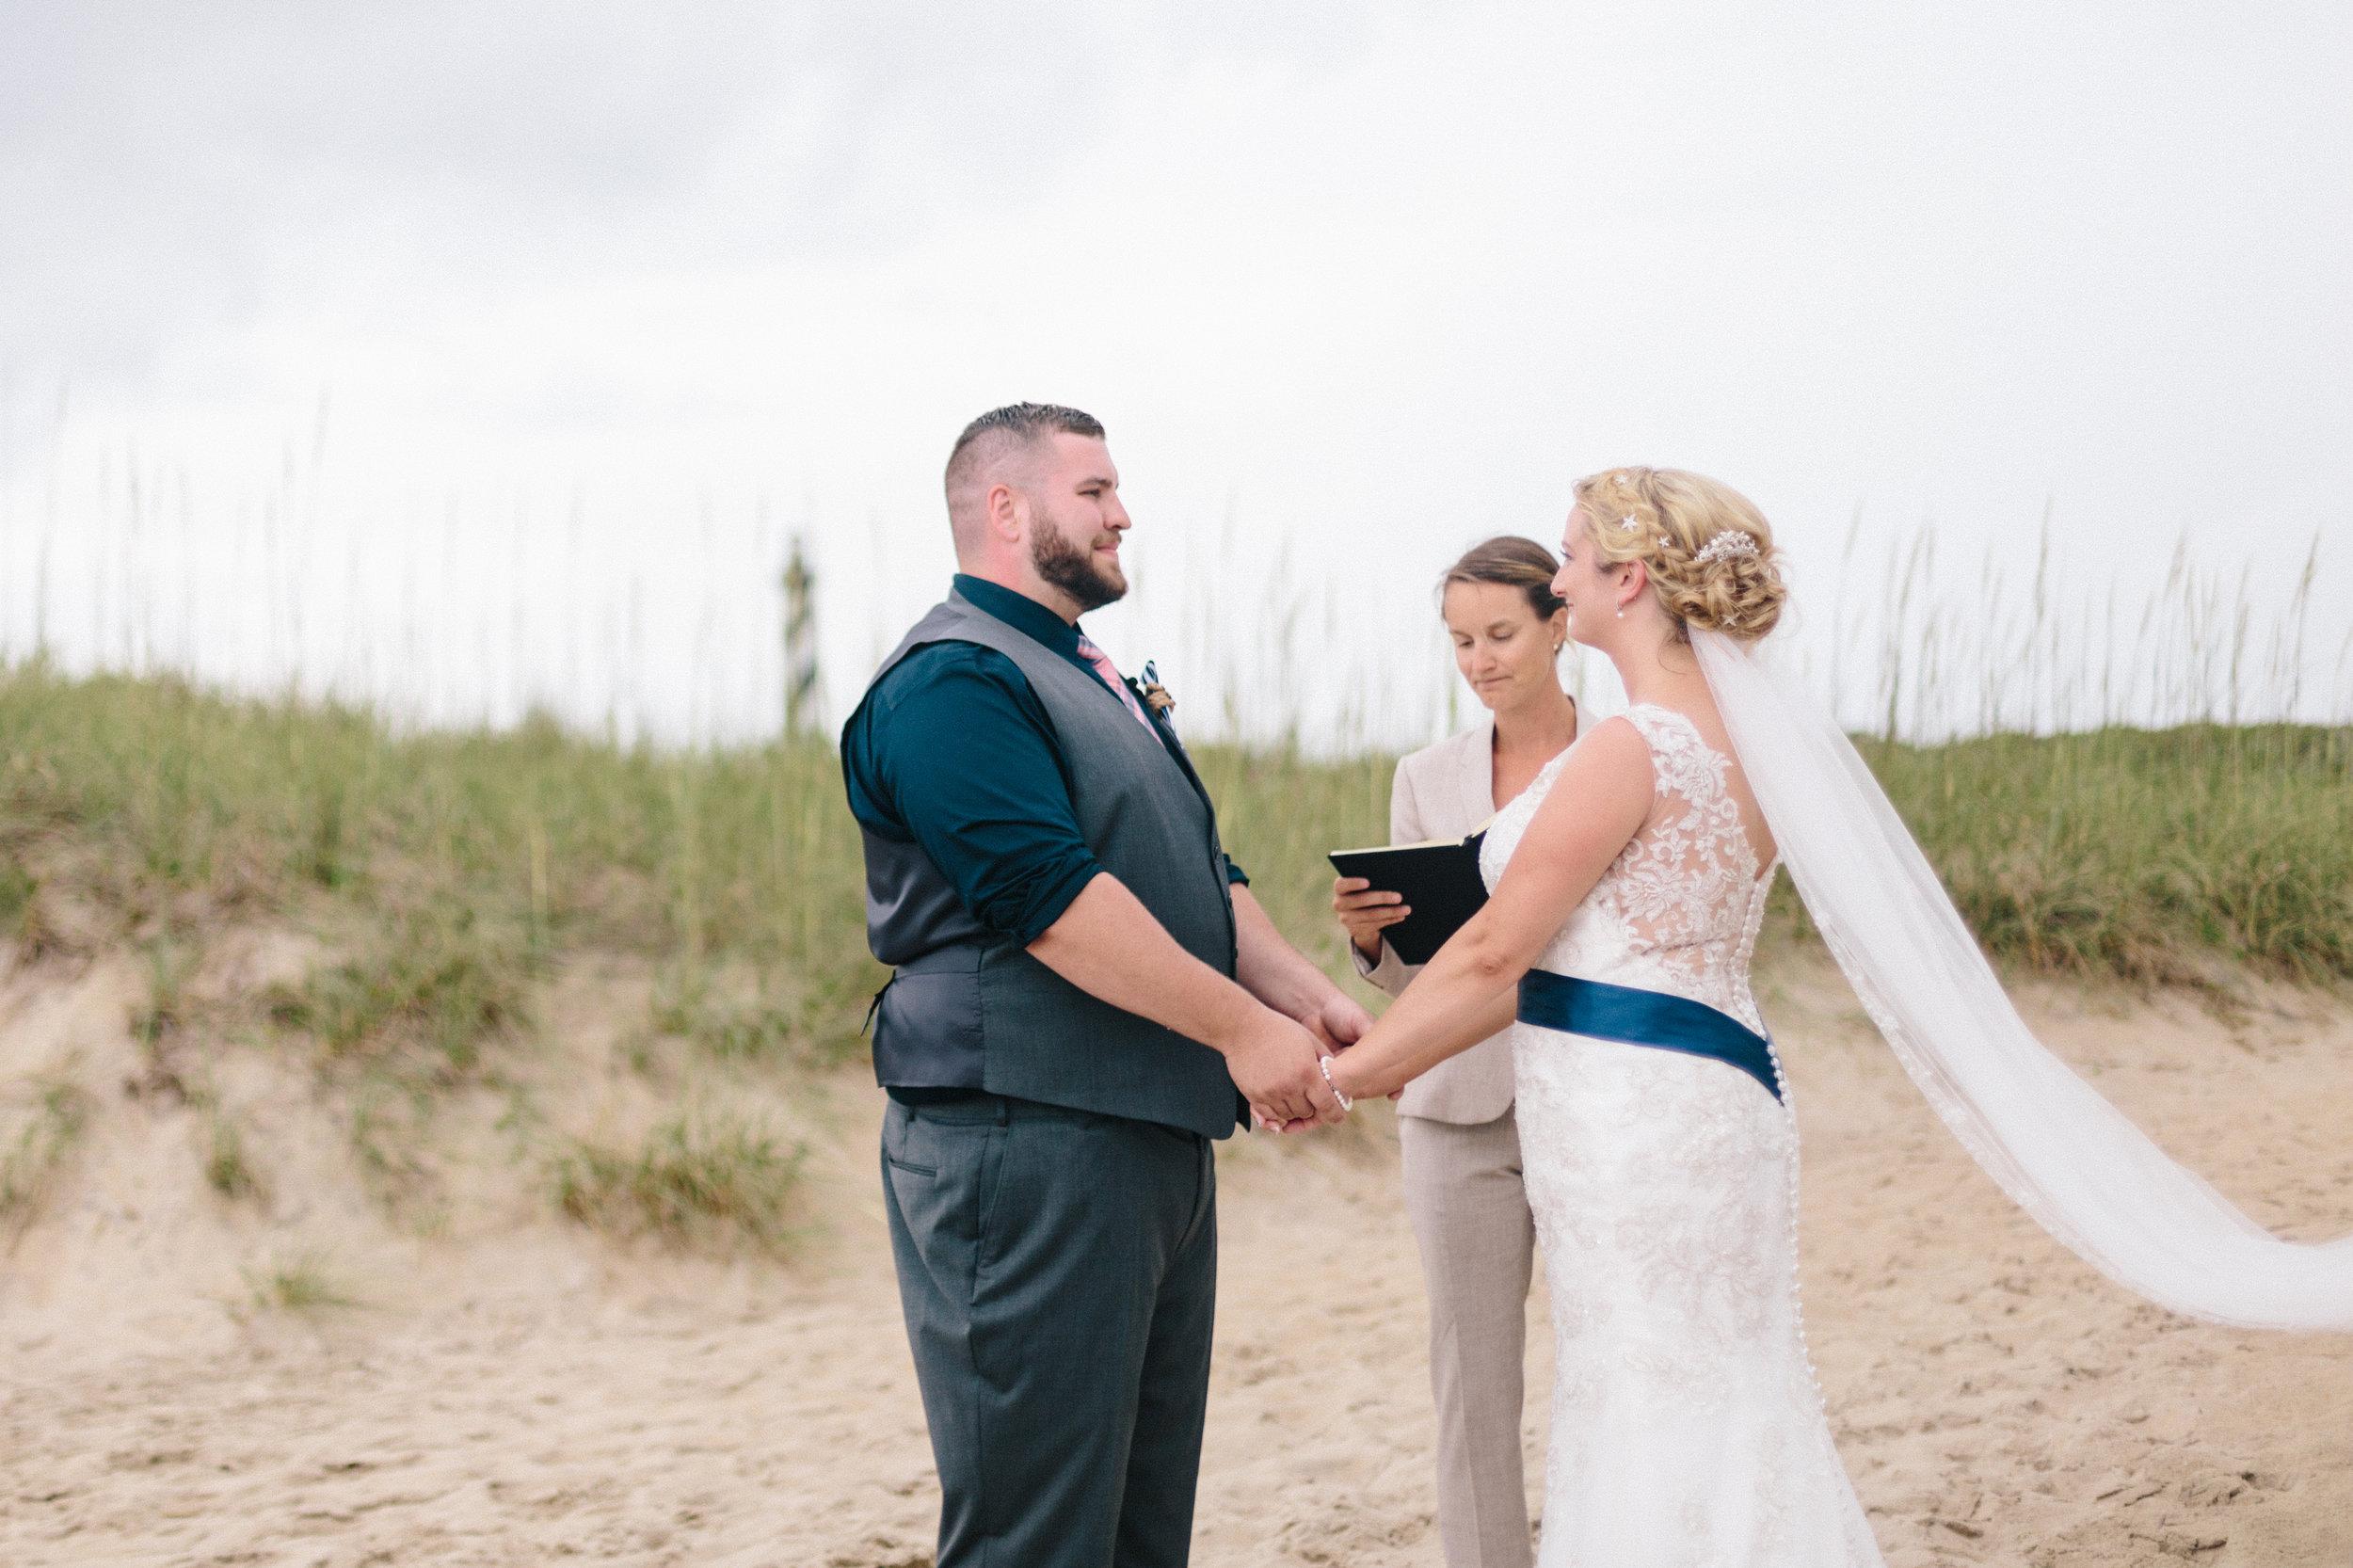 alyssa barletter photography buxton north carolina outer banks obx cape hatteras elopement intmate beach wedding-21.jpg